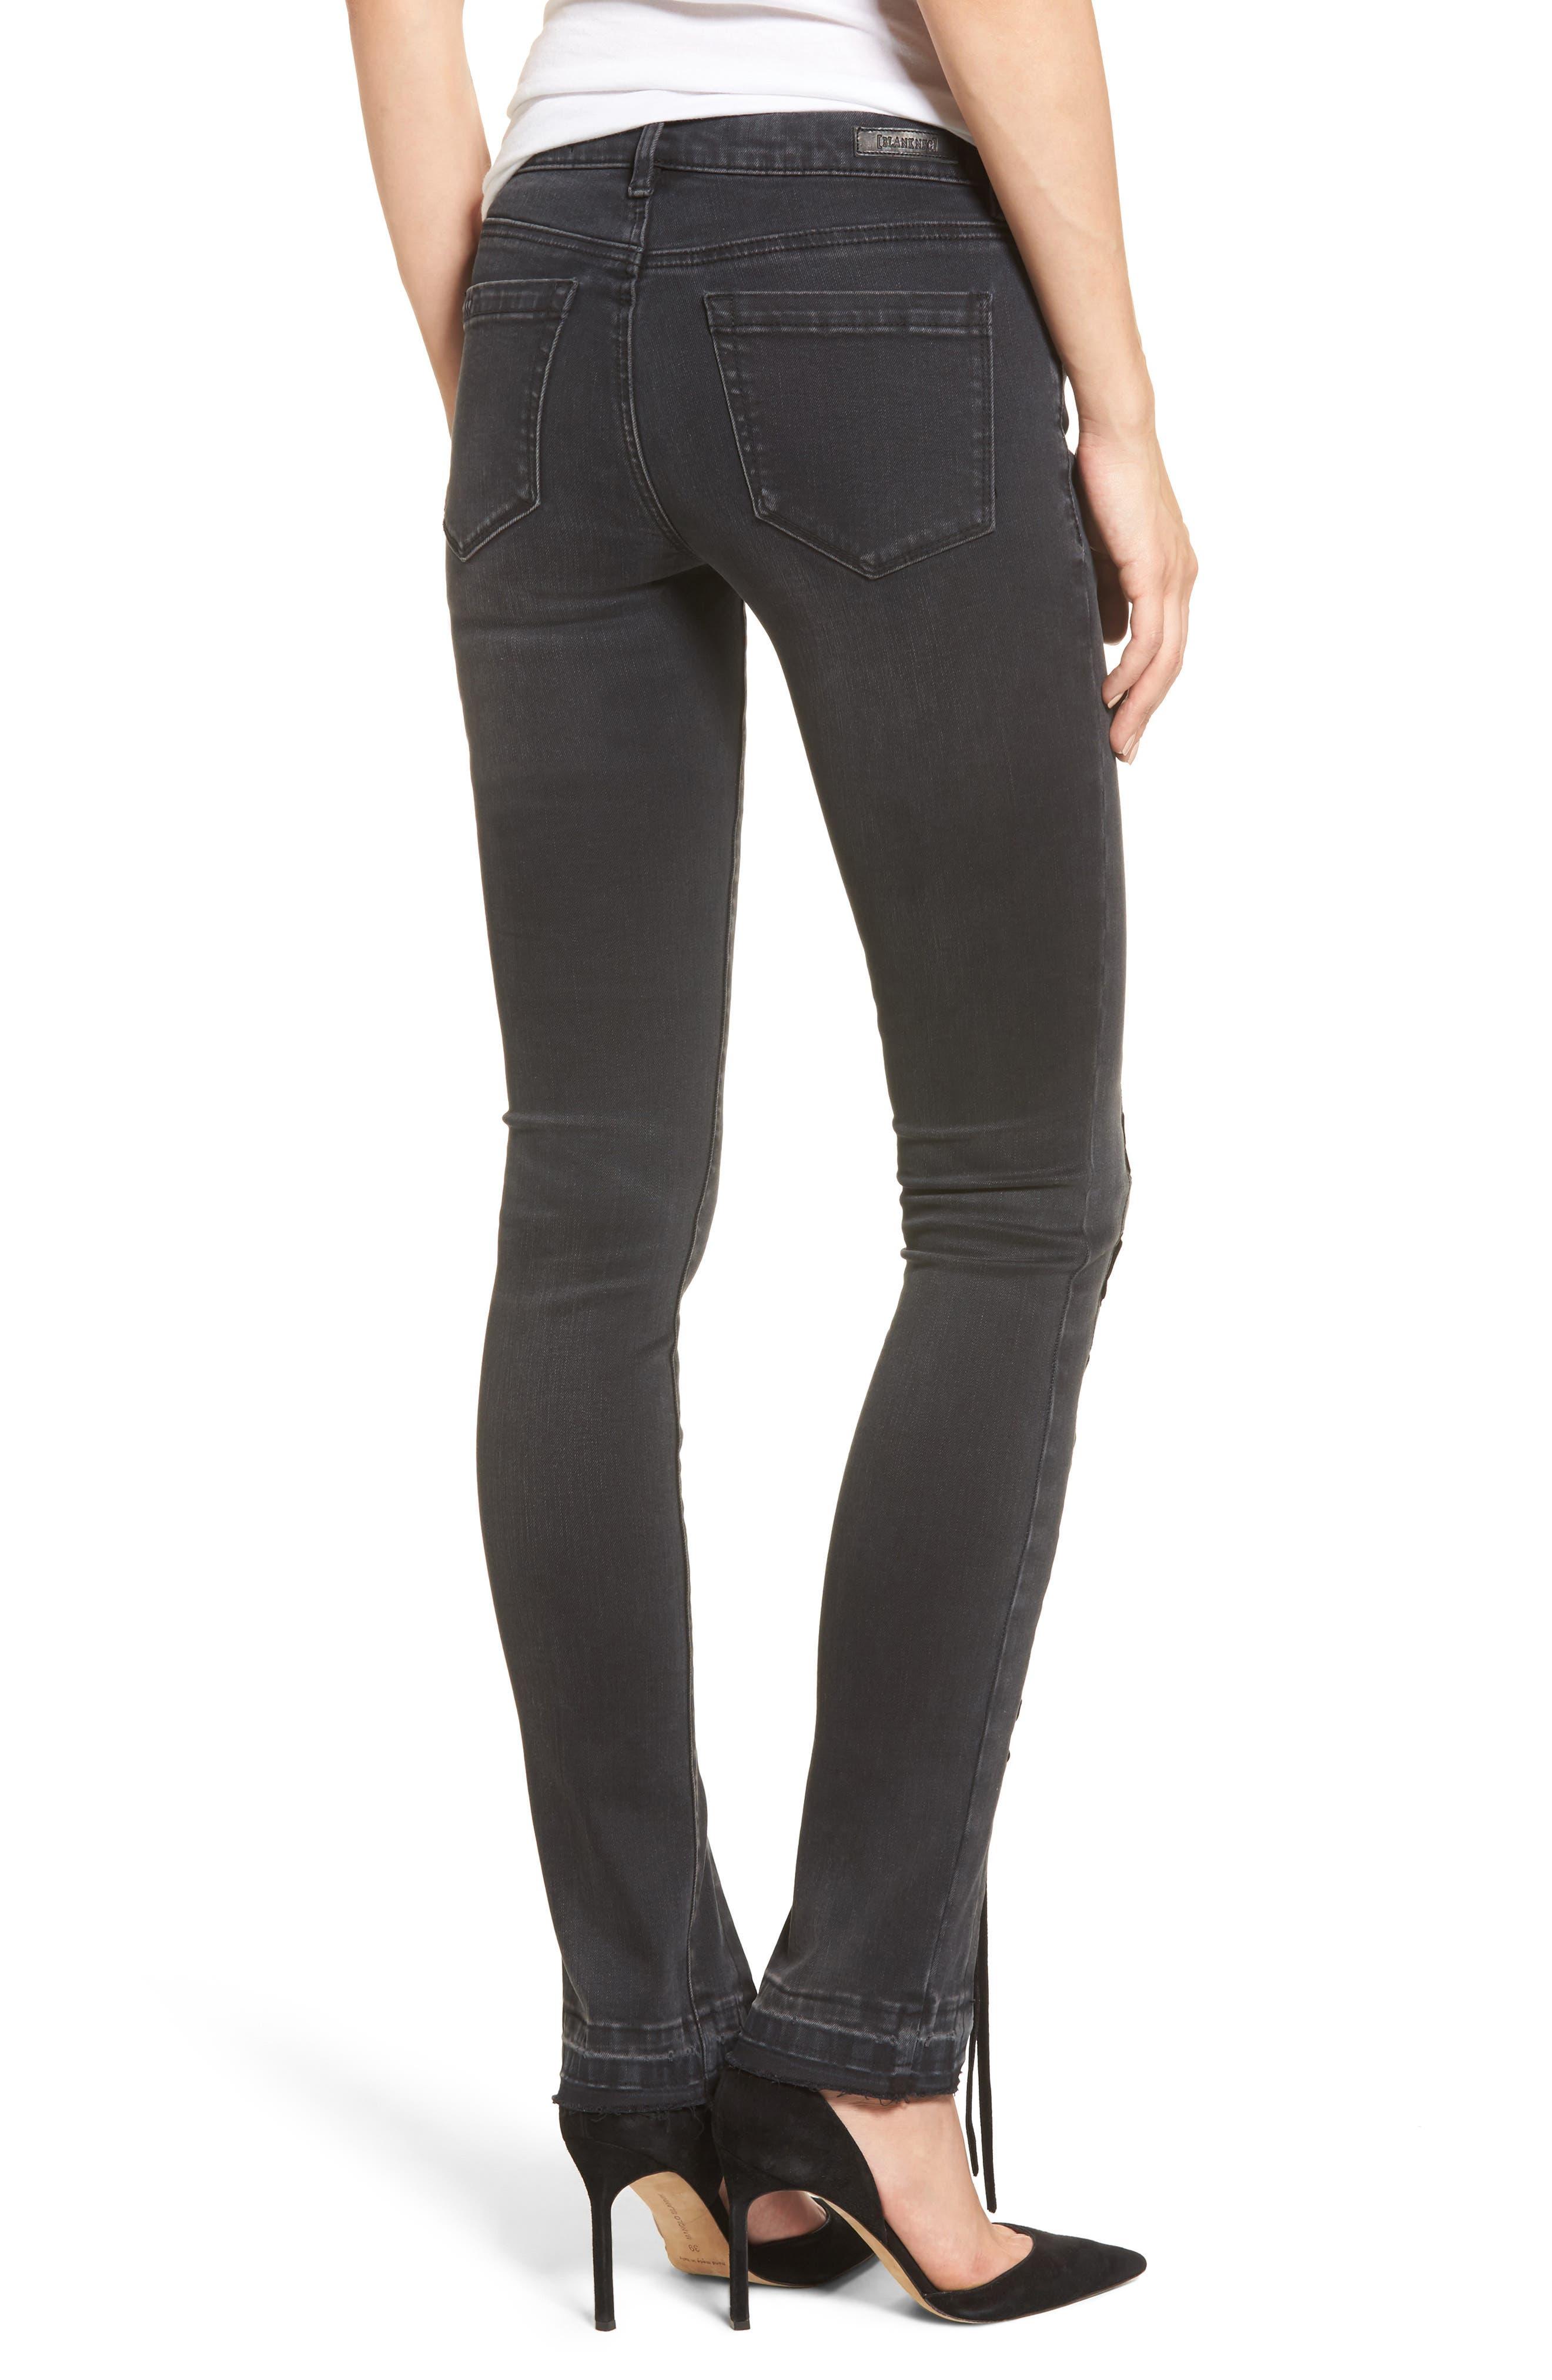 Alternate Image 2  - BLANKNYC Crash Tactics Lace Up Skinny Jeans